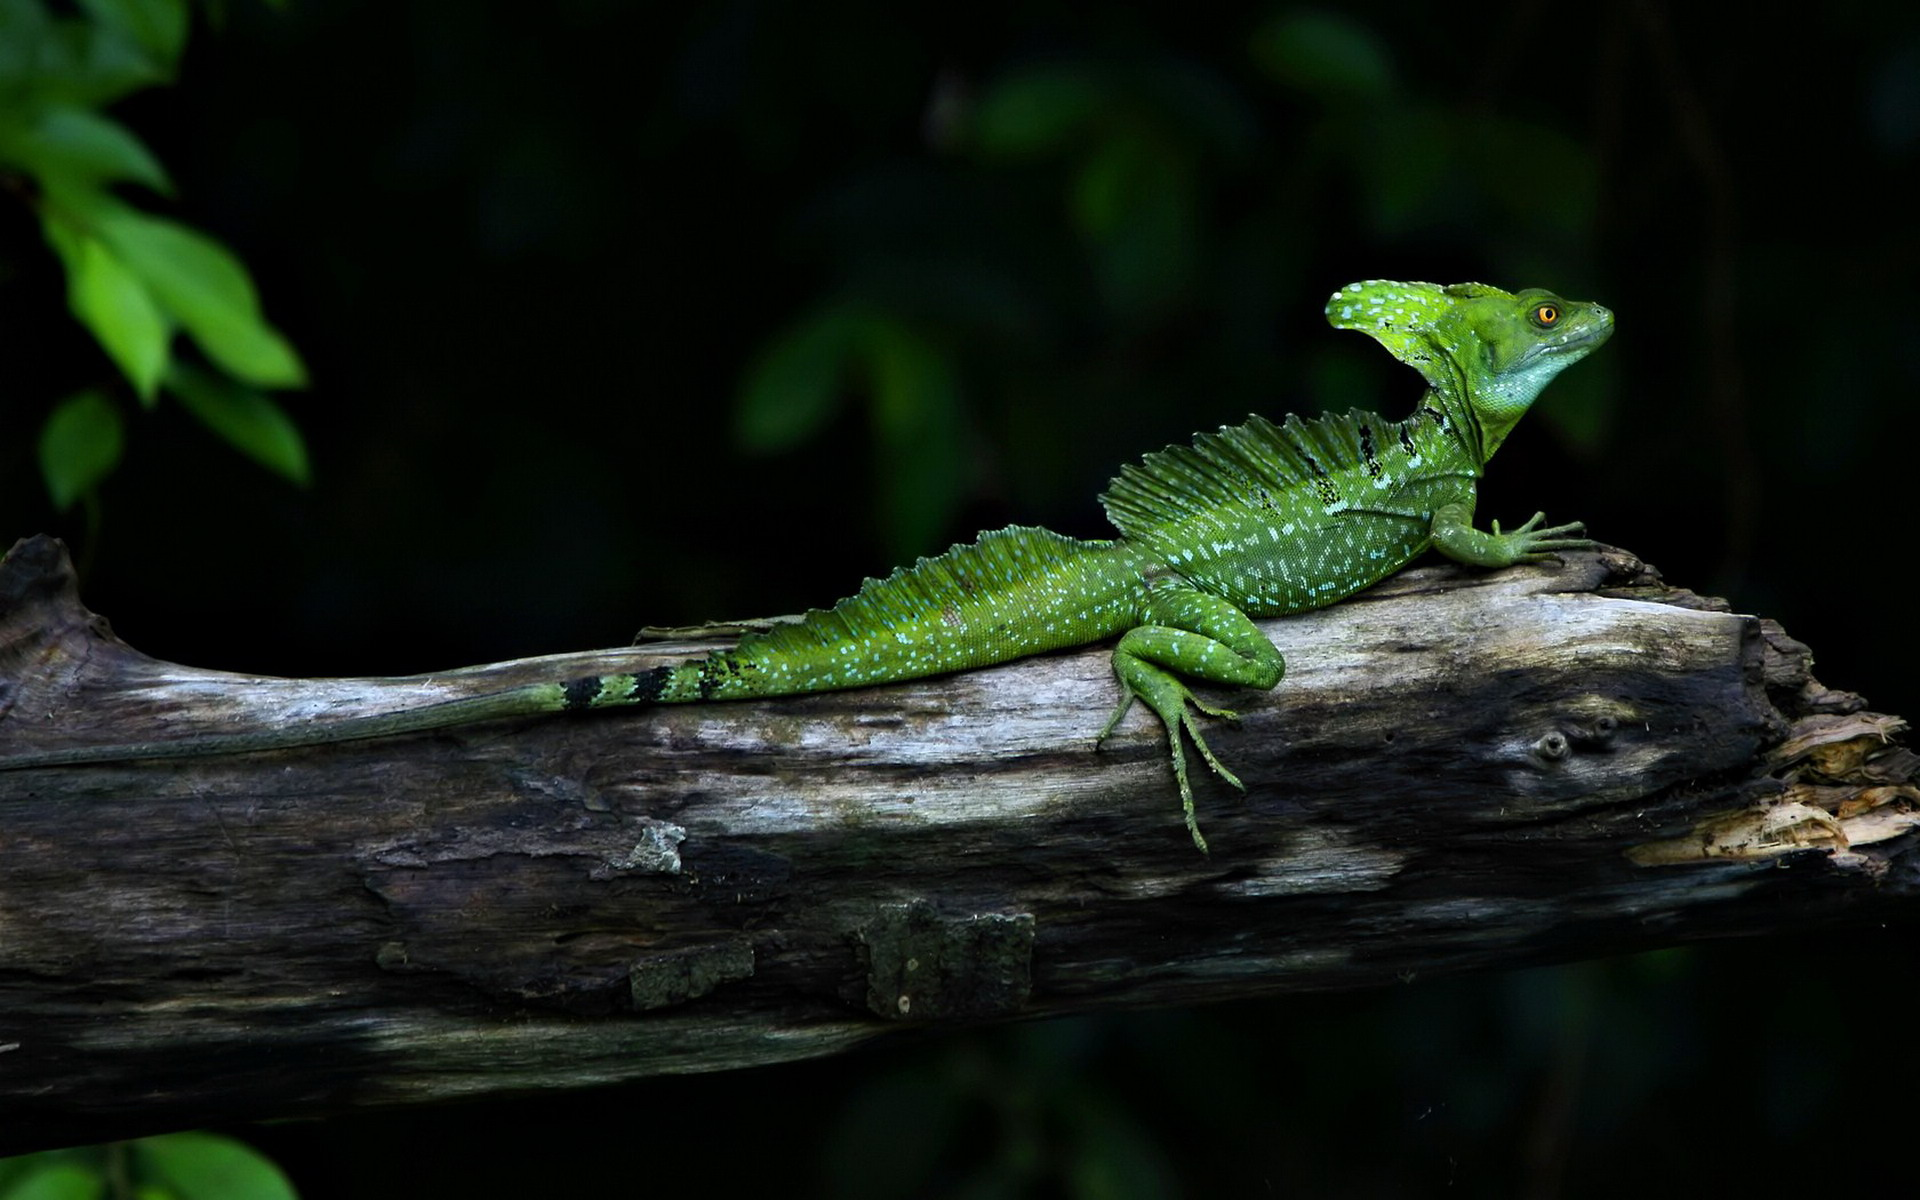 Basilisk Lizard Pictures Green Basilisk Lizard Yecfil